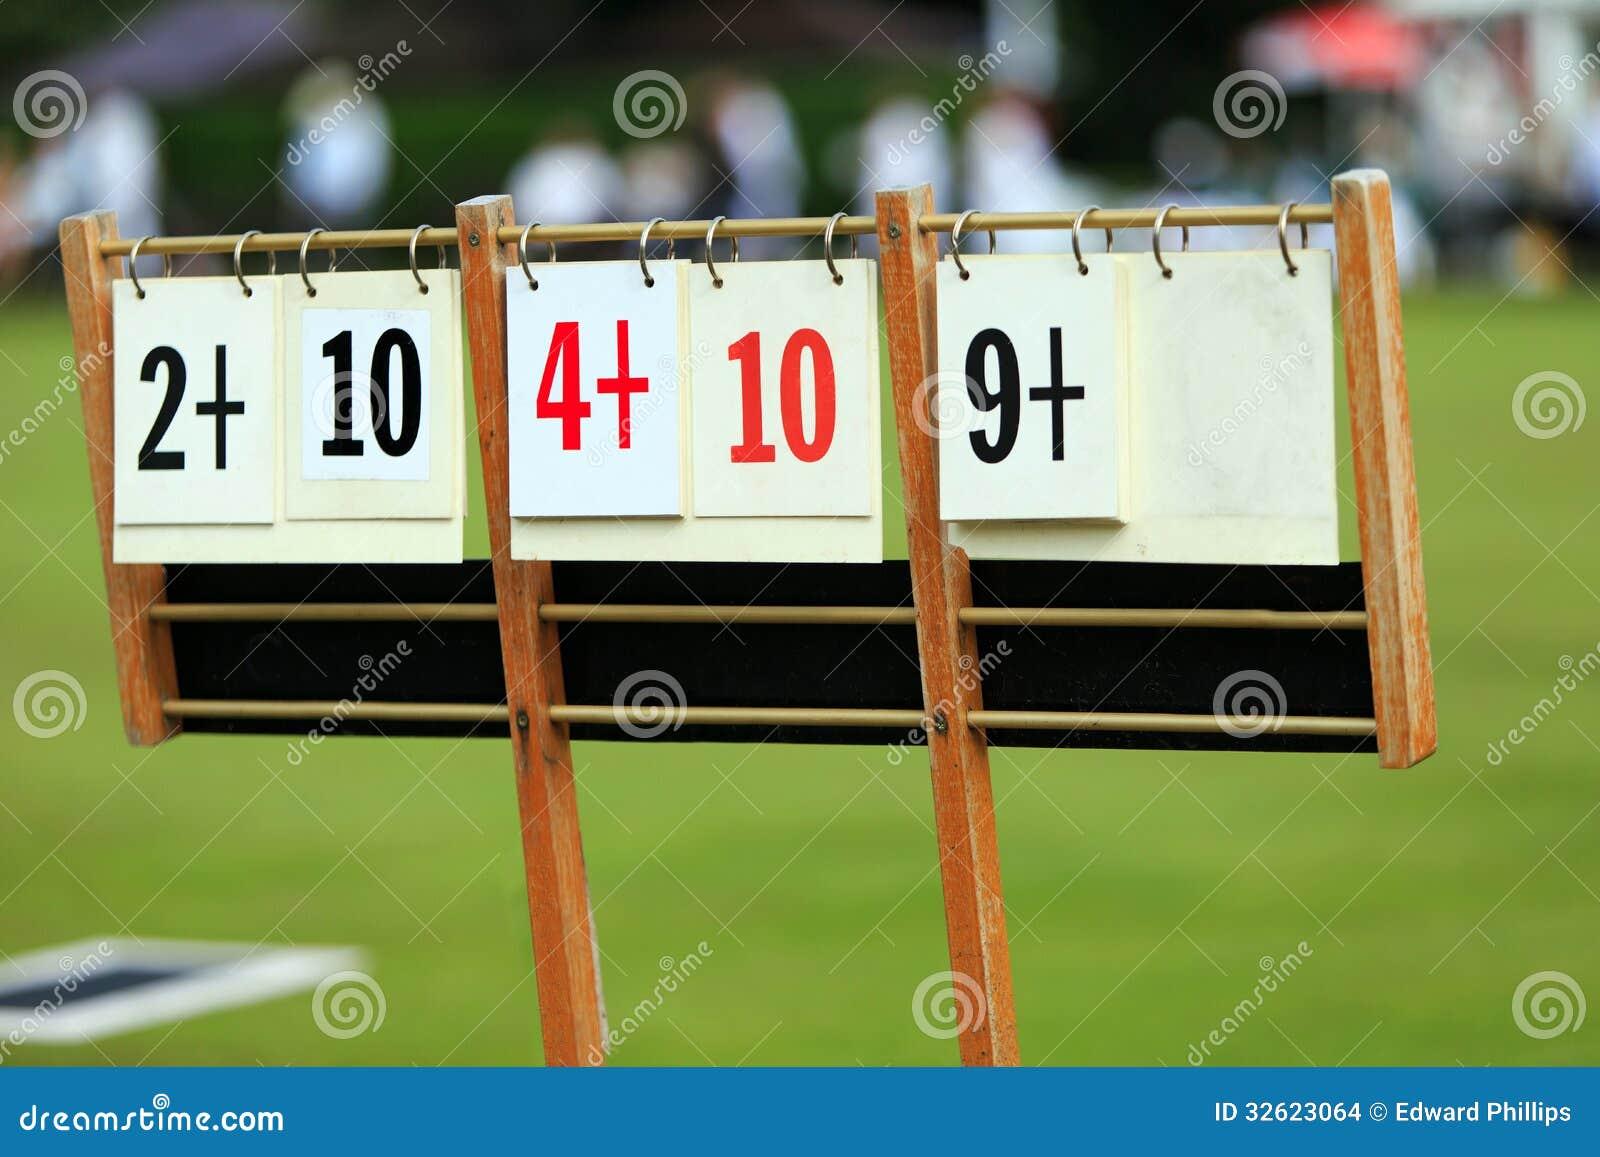 Scoreboard At A Lawn Bowls Match Stock Photo Image Of